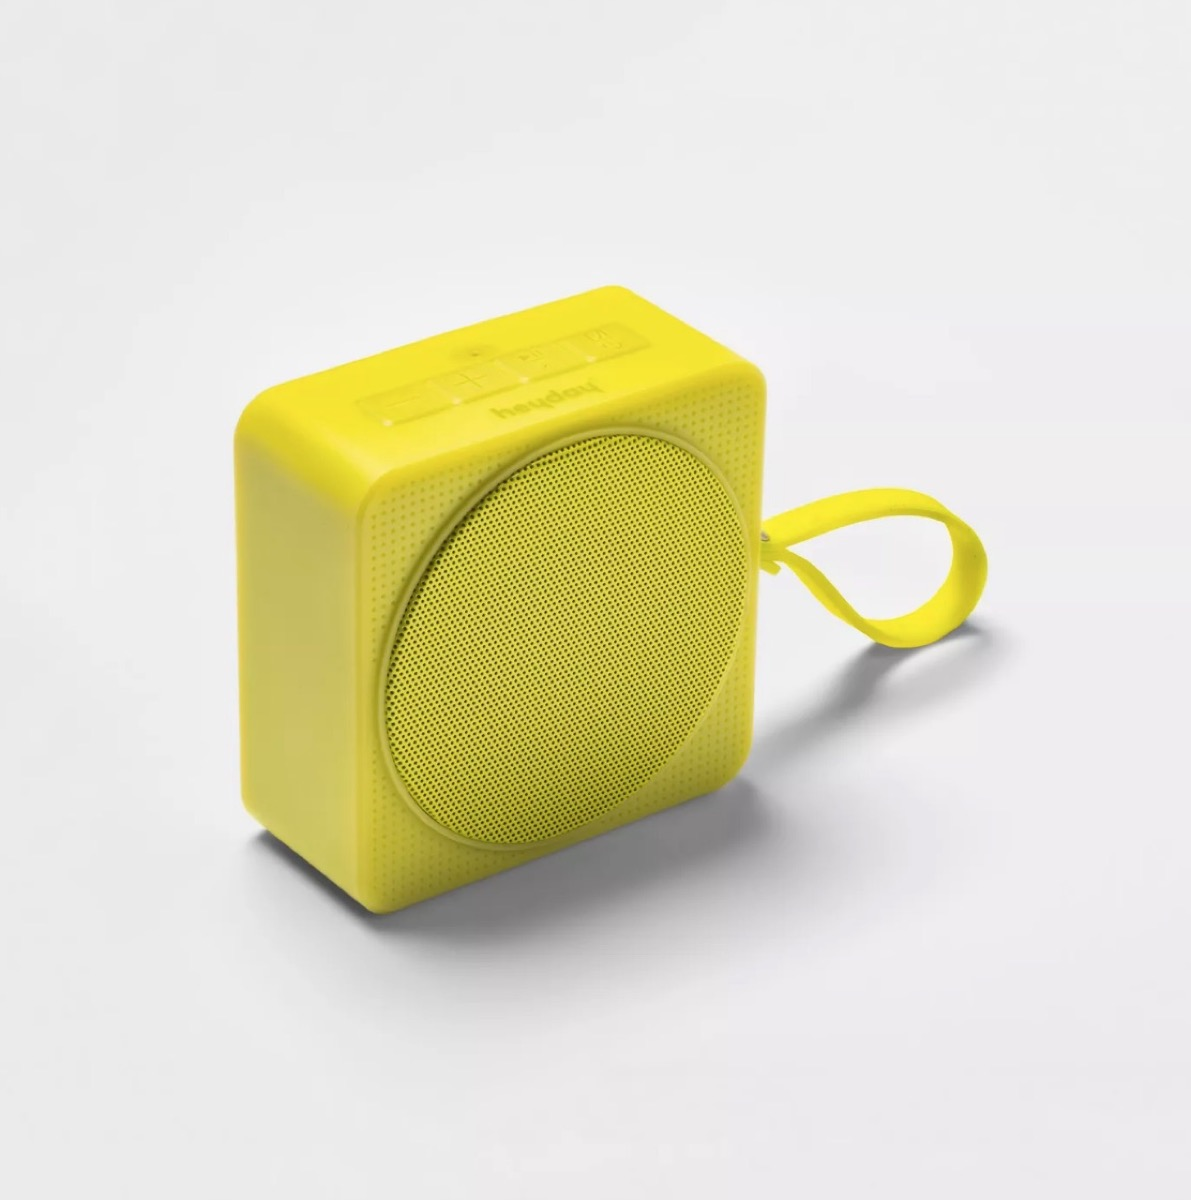 yellow portable speaker, summer party essentials